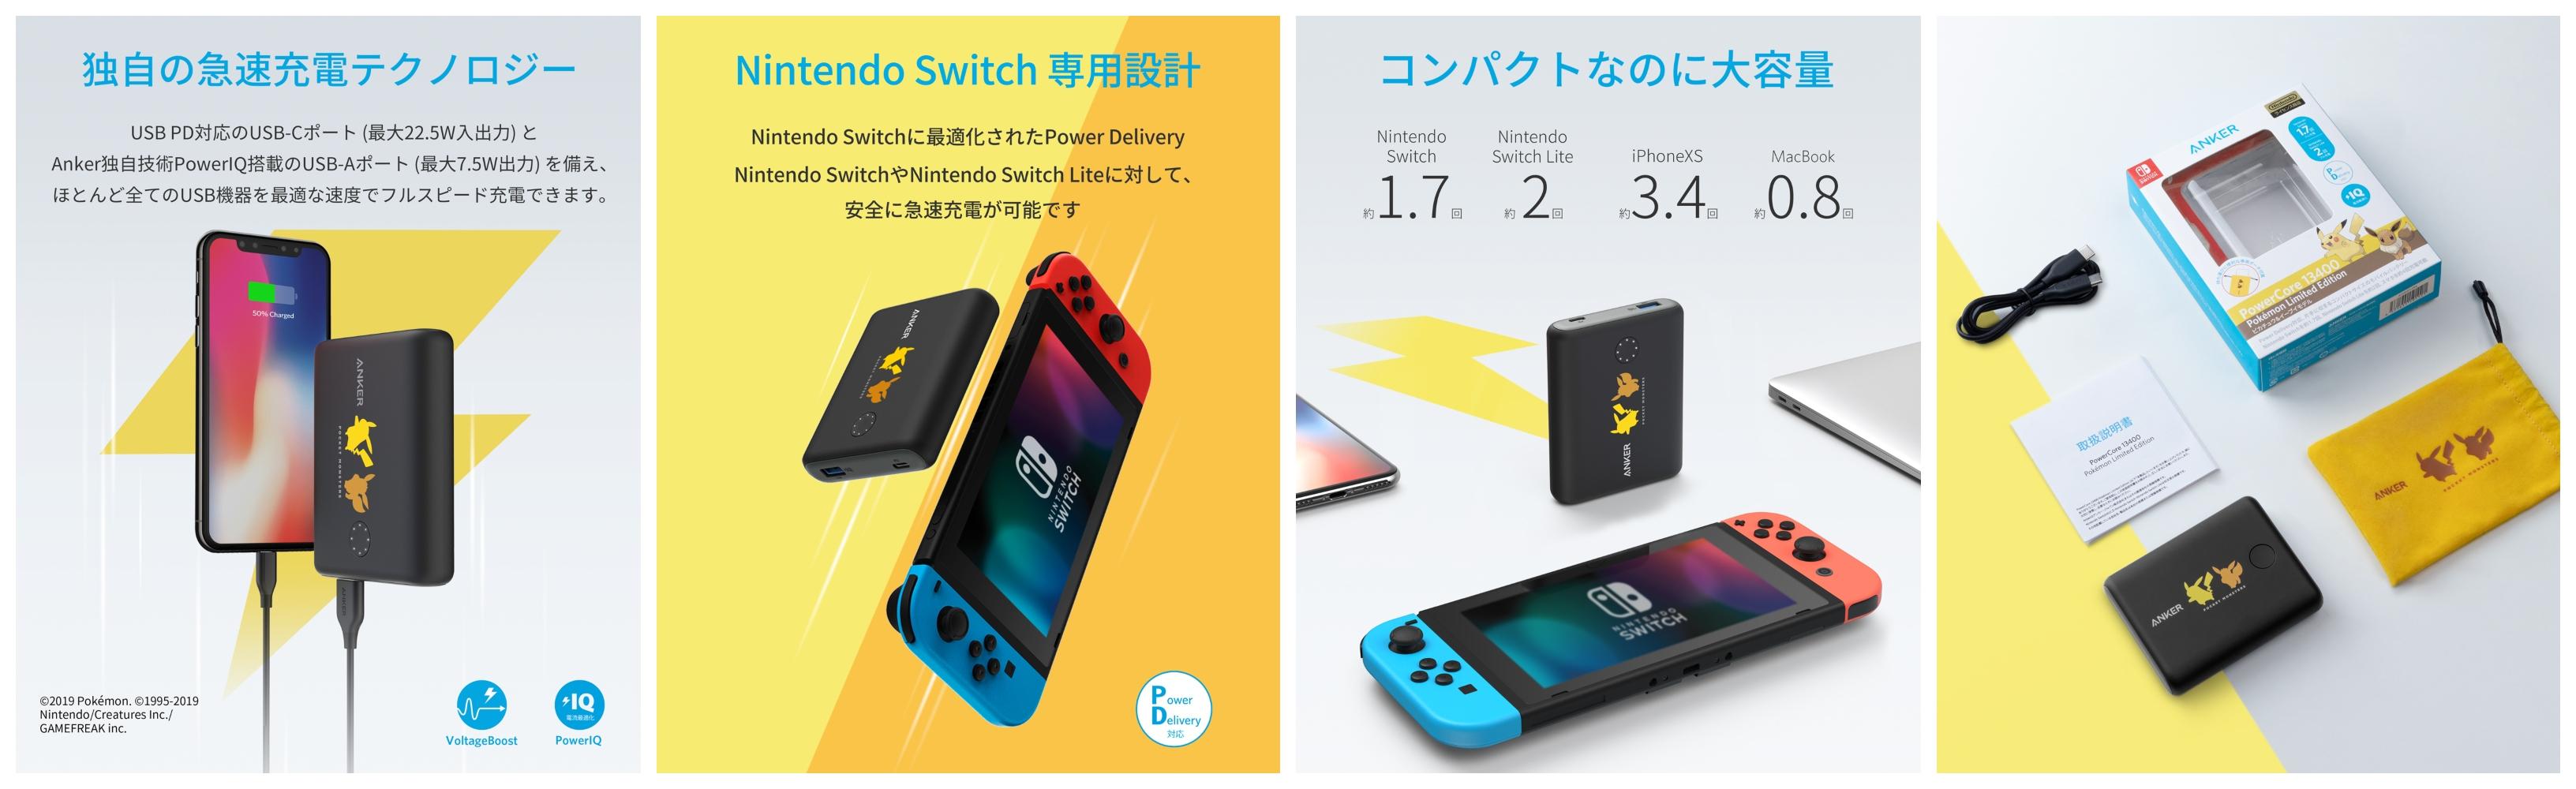 Anker PowerCore 13400 Pokémon Limited Edition ピカチュウ&イーブイモデル|PD対応大容量モバイルバッテリ―